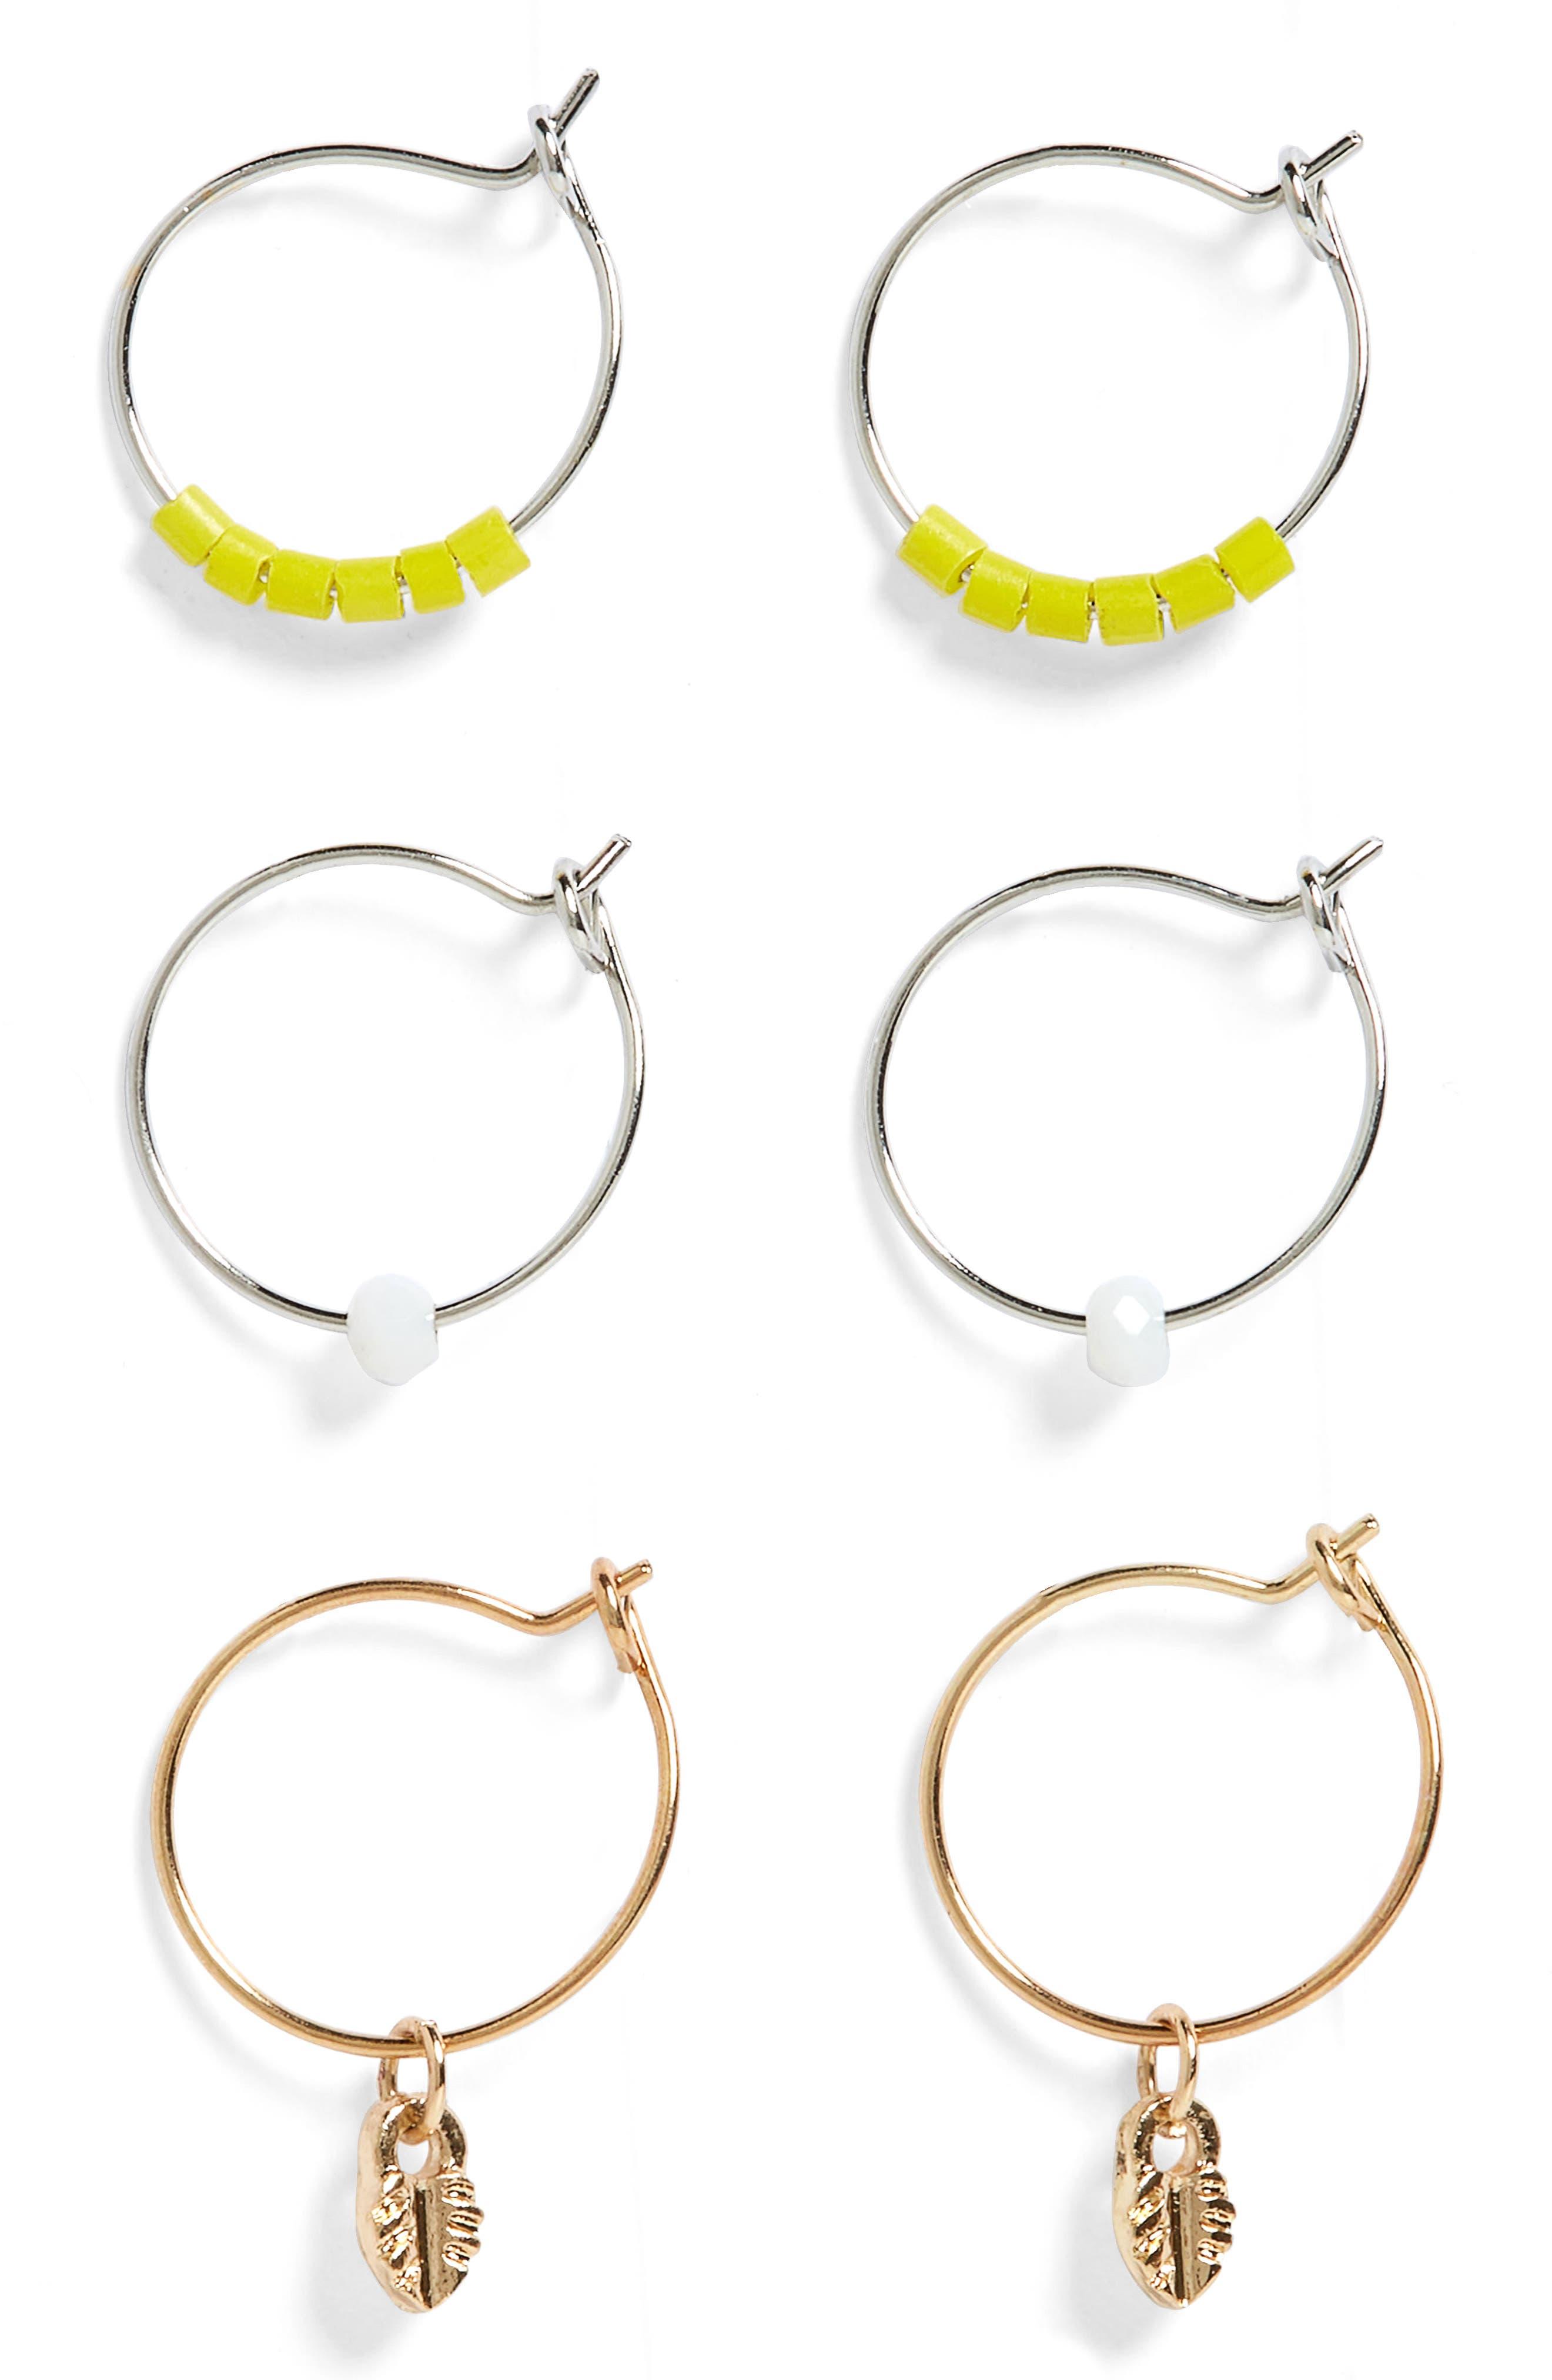 Set of 3 Charm Hoop Earrings,                             Main thumbnail 1, color,                             Bright Multi